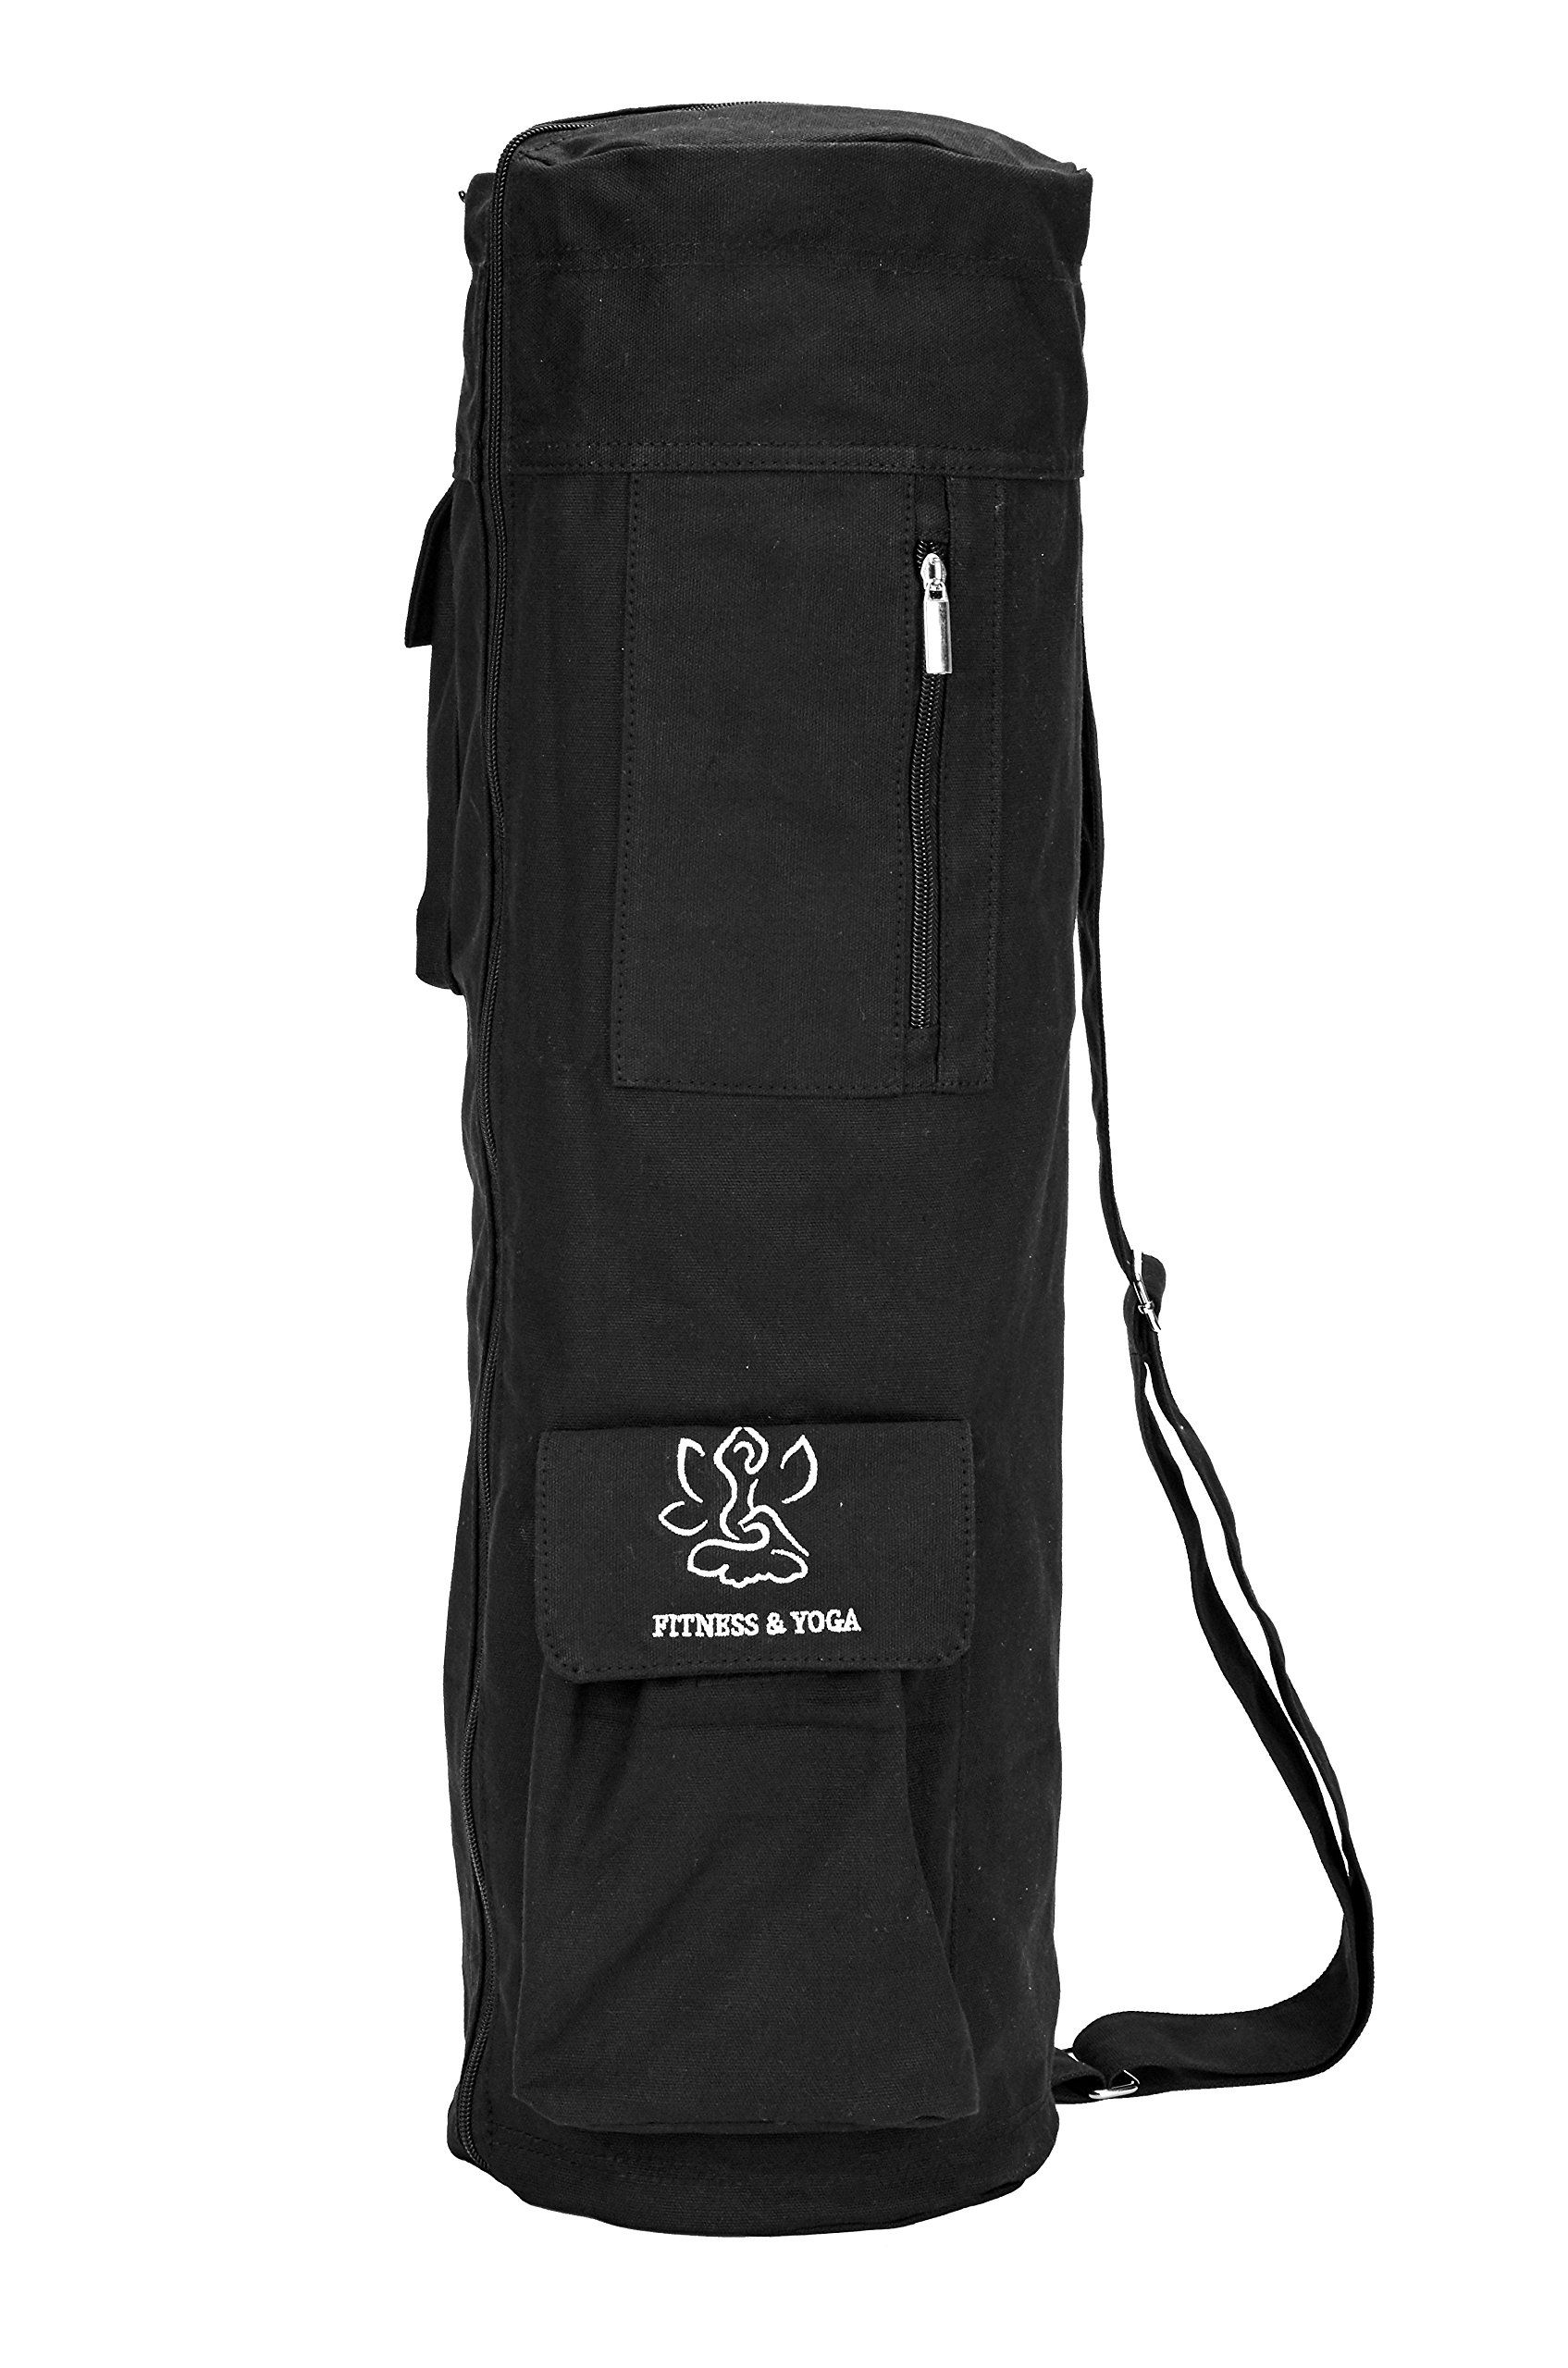 03ecd34eade8 Yoga Mat Bag Full-Zip Exercise Mat Carry Bag with Multi-Functional  Expandable Storage